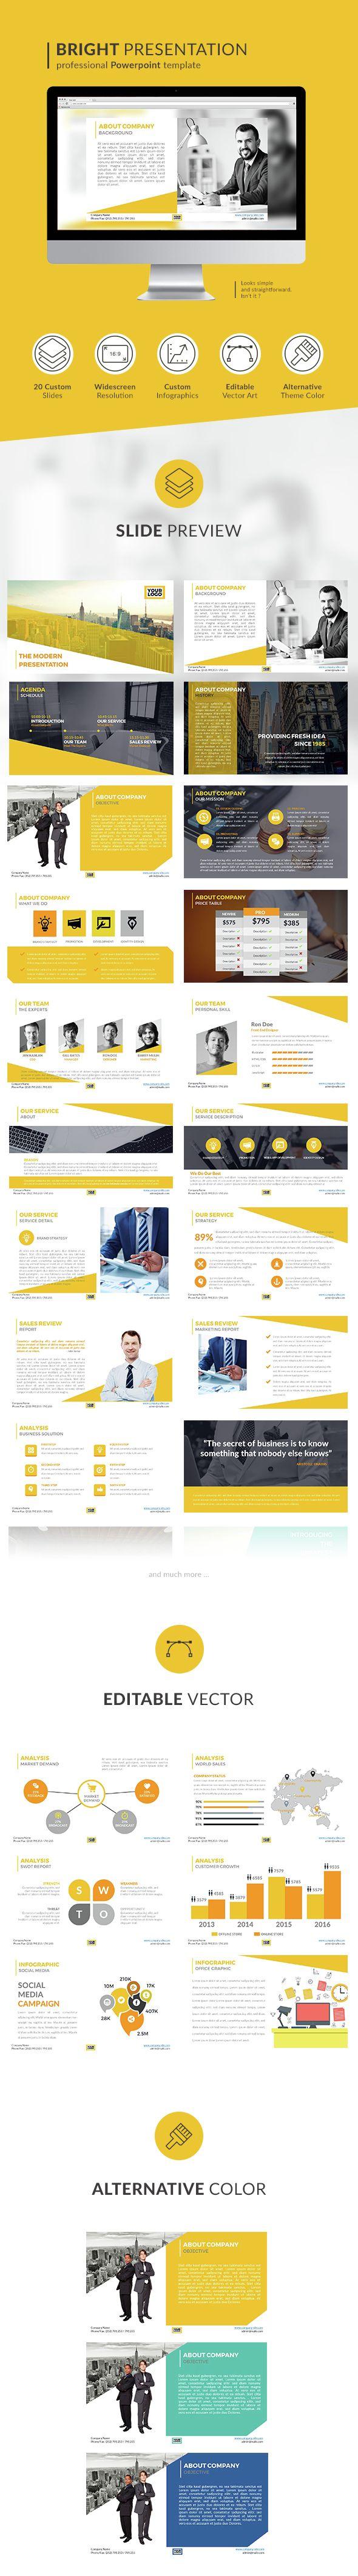 Modern Bright PowerPoint Presentation Template. Download here: http://graphicriver.net/item/modern-bright-presentation/14831257?ref=ksioks